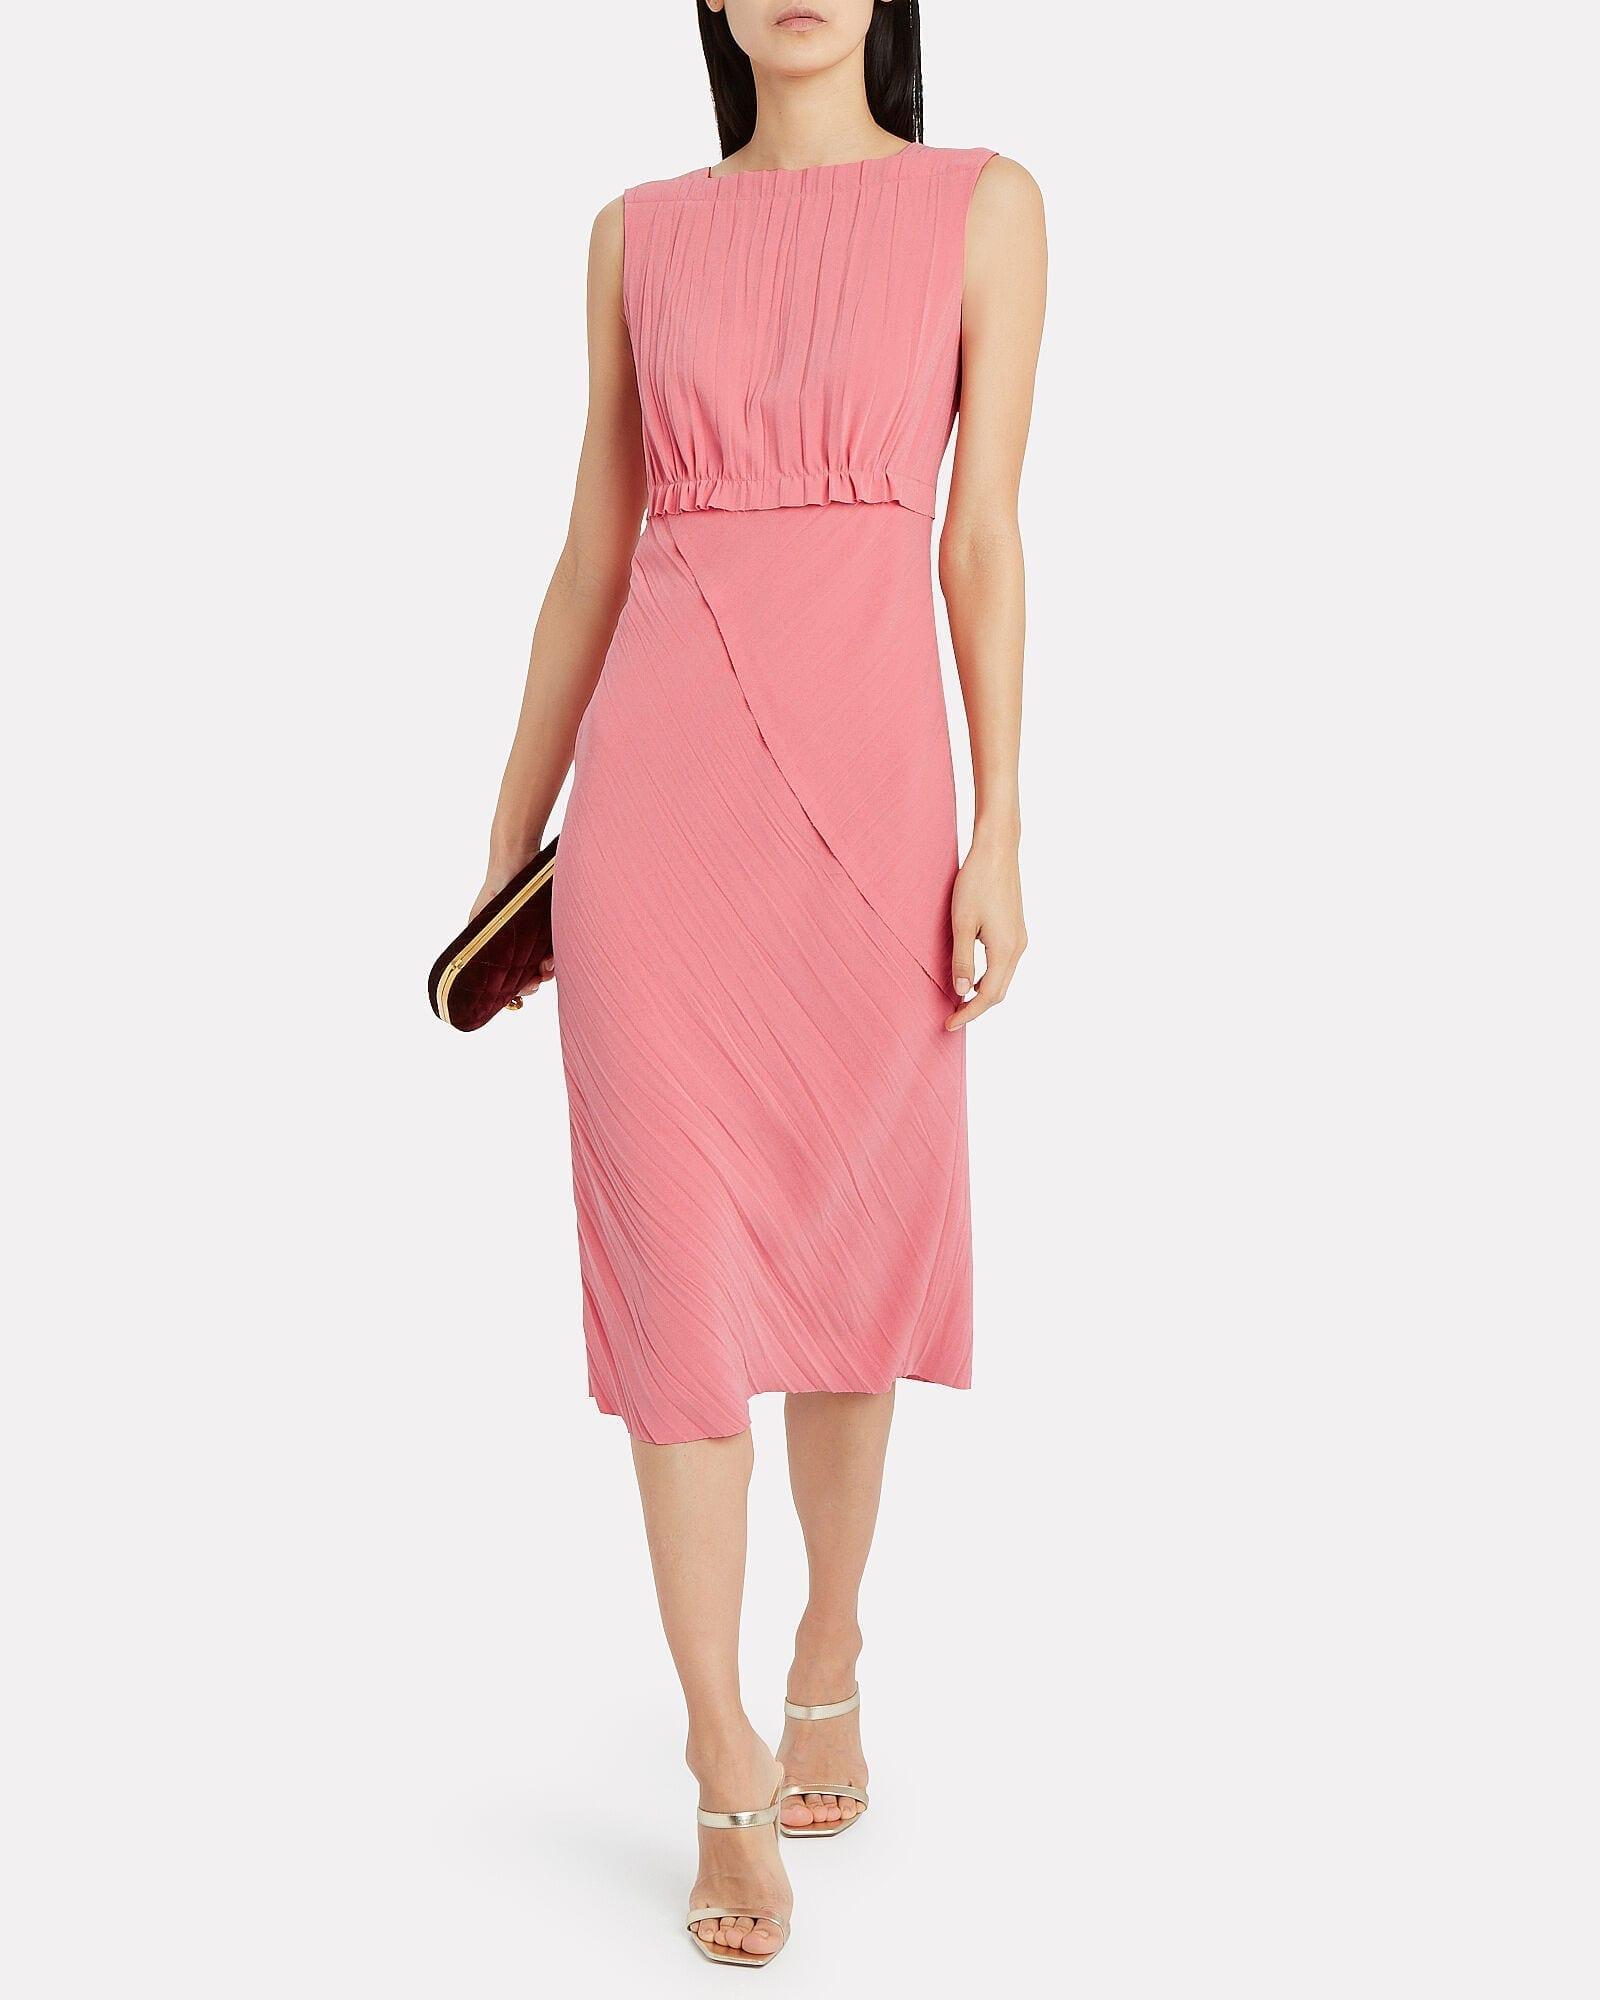 JASON WU COLLECTION Crinkle Crepe Sleeveless Dress